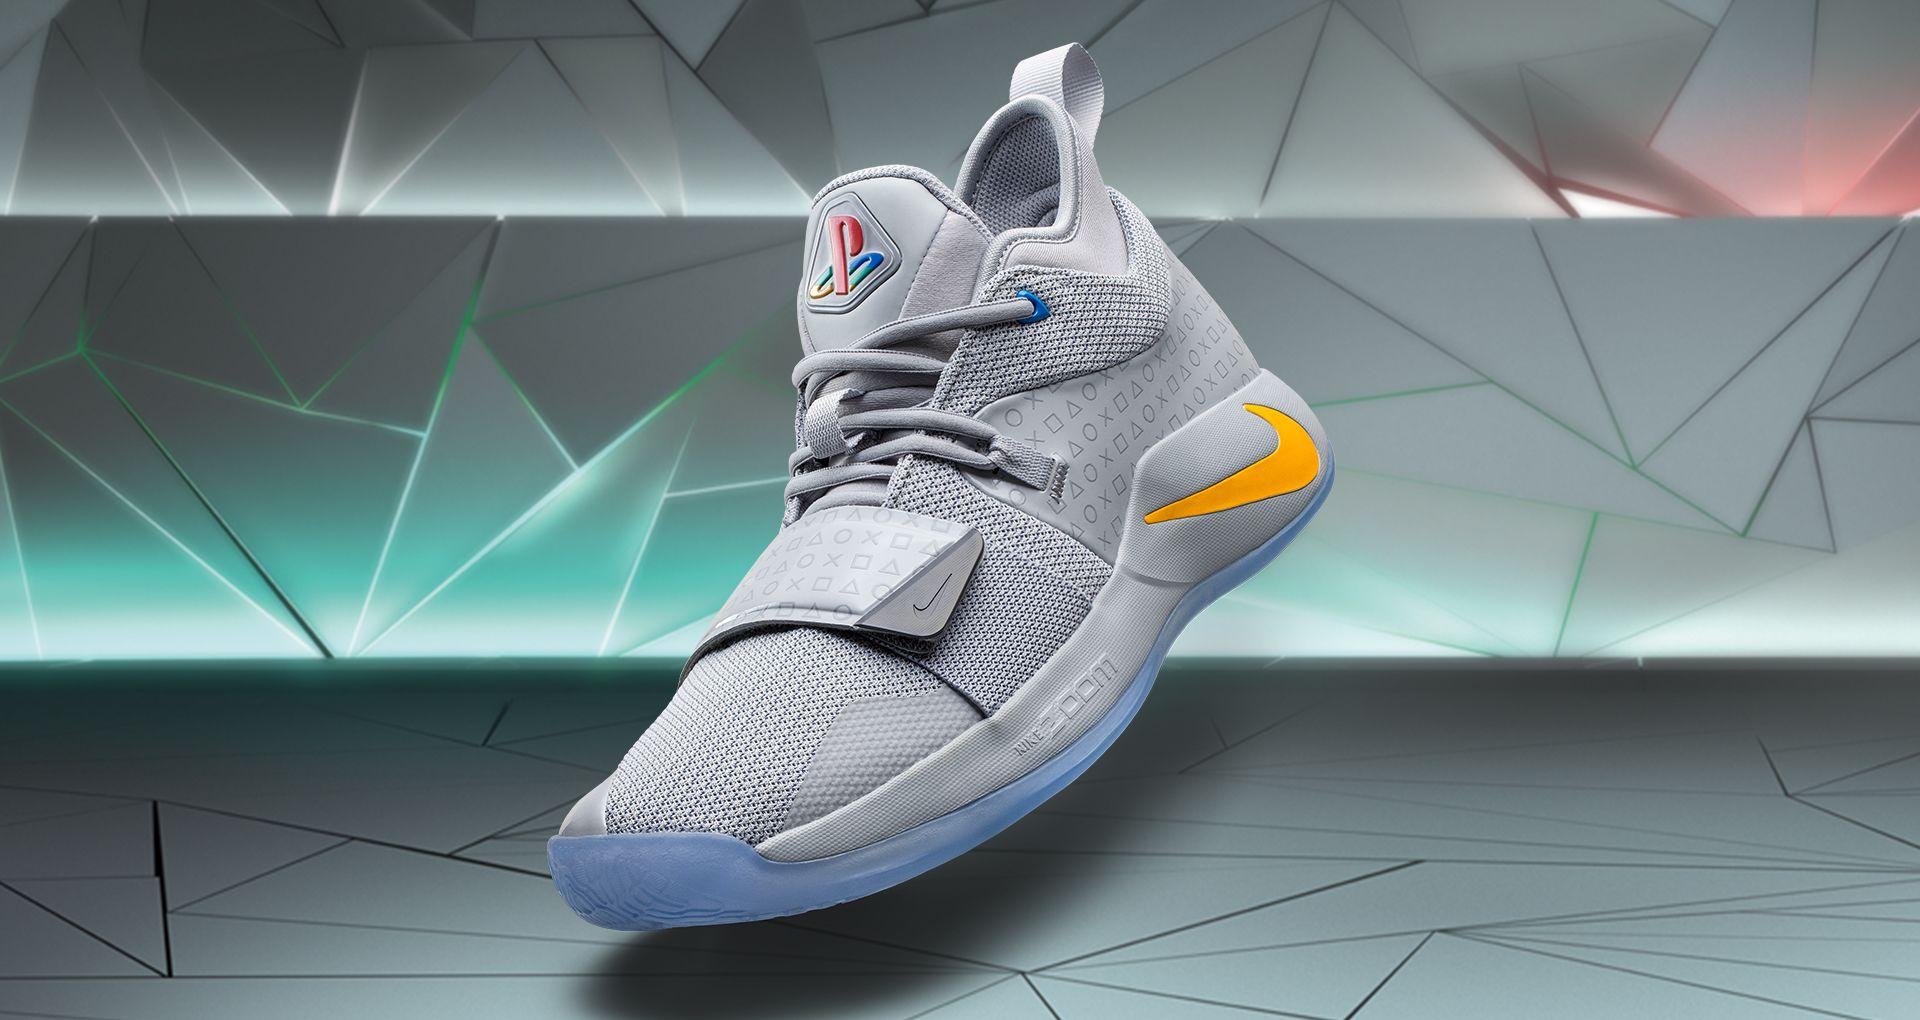 PG 2.5 x PlayStation Colorway: Retro-Sneakers für Gamer